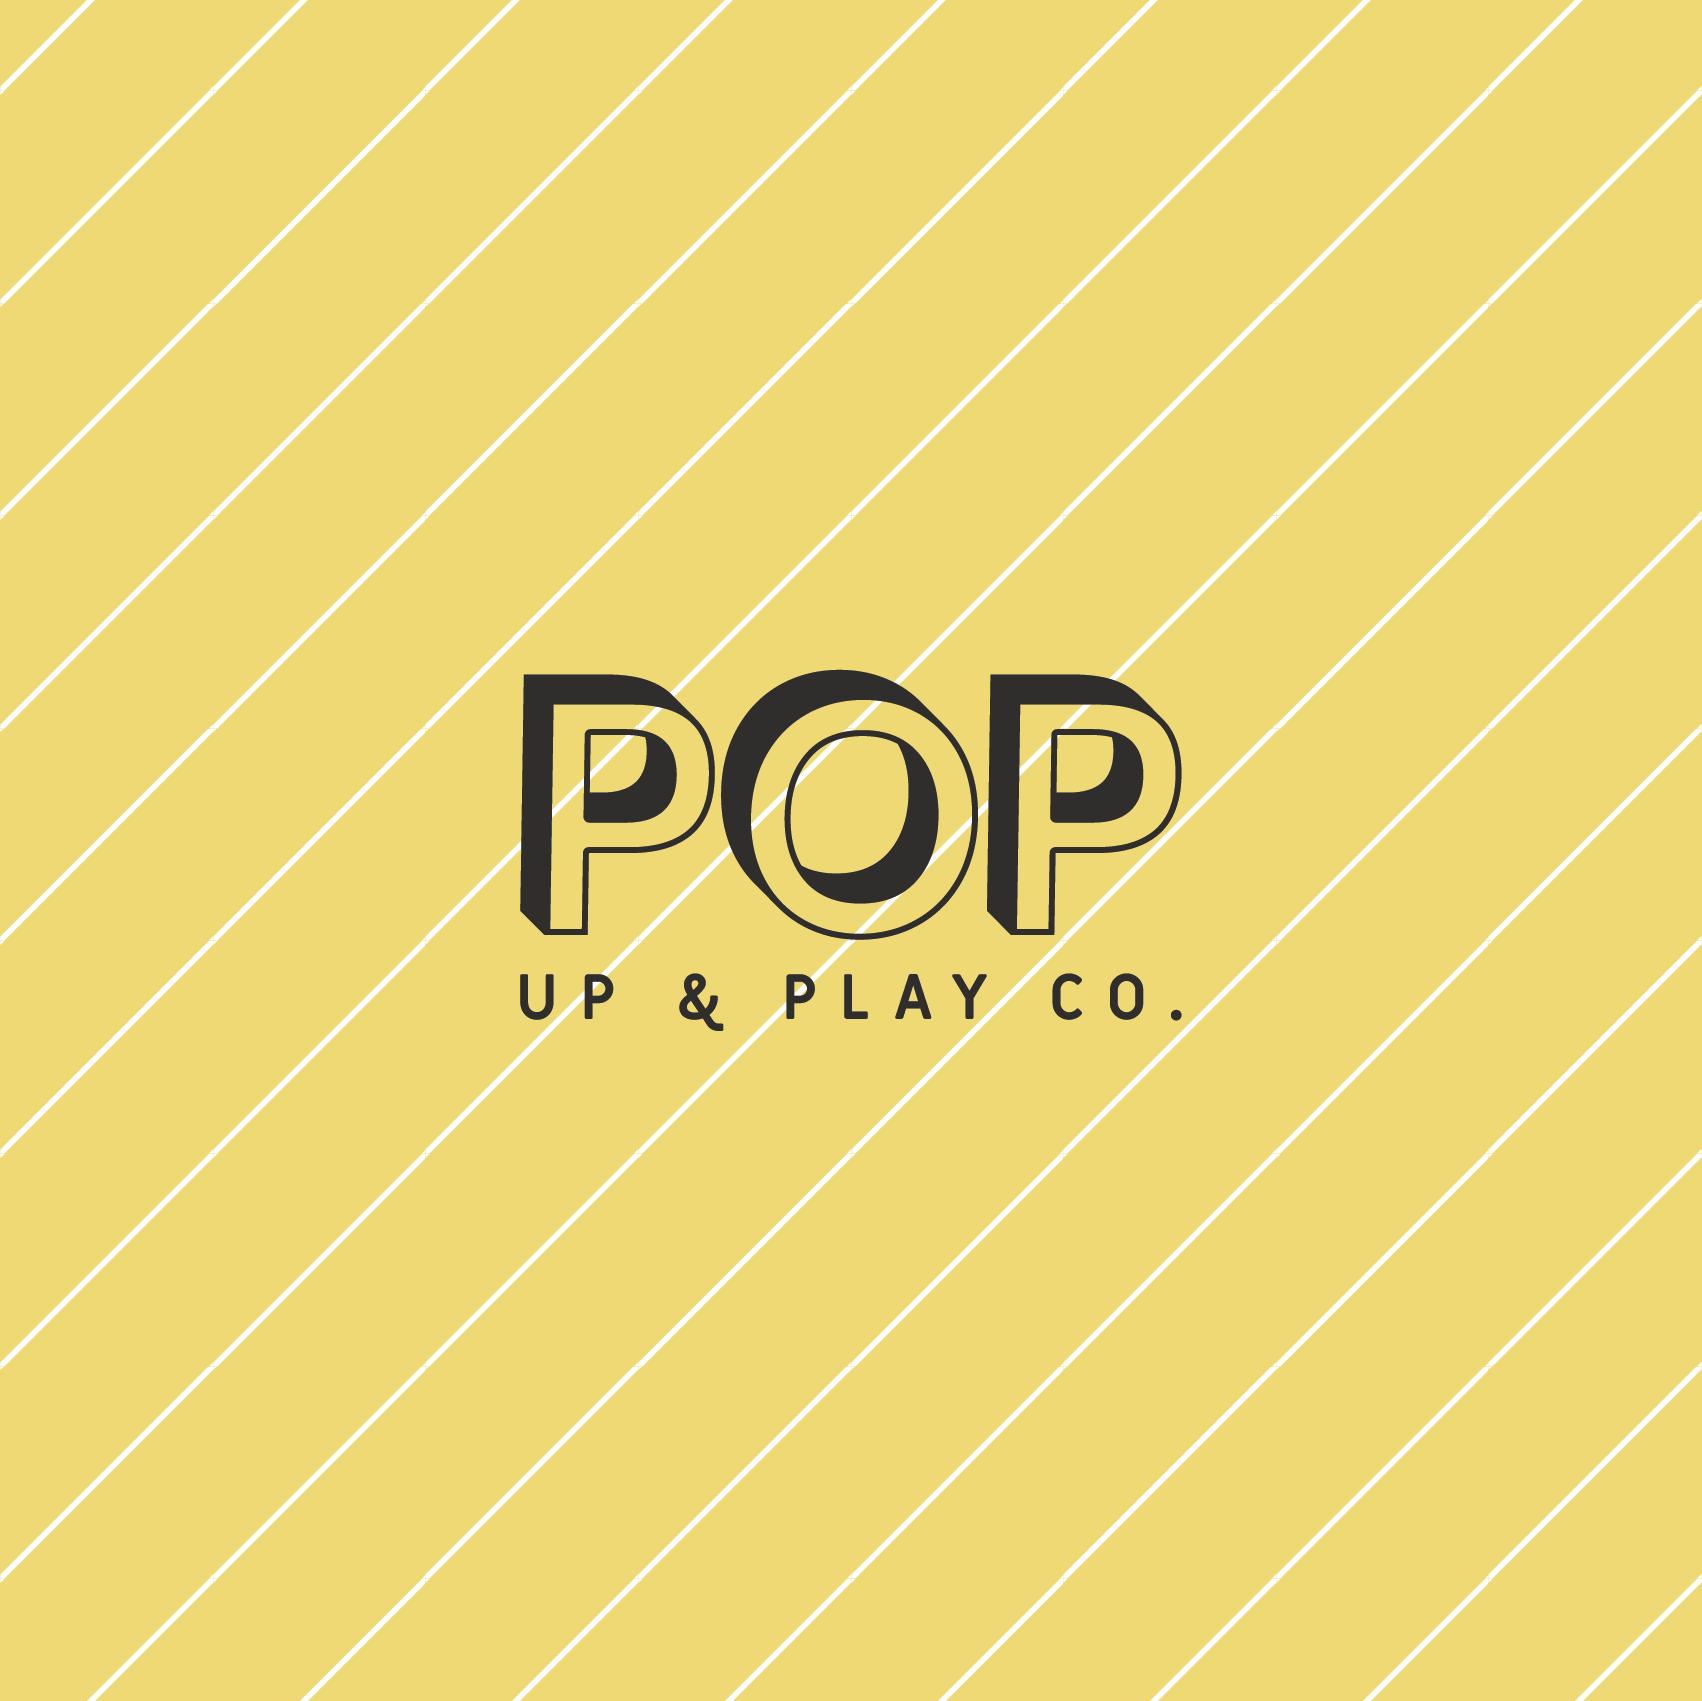 Pop Yellow Diag Pattern Sq@2x.png